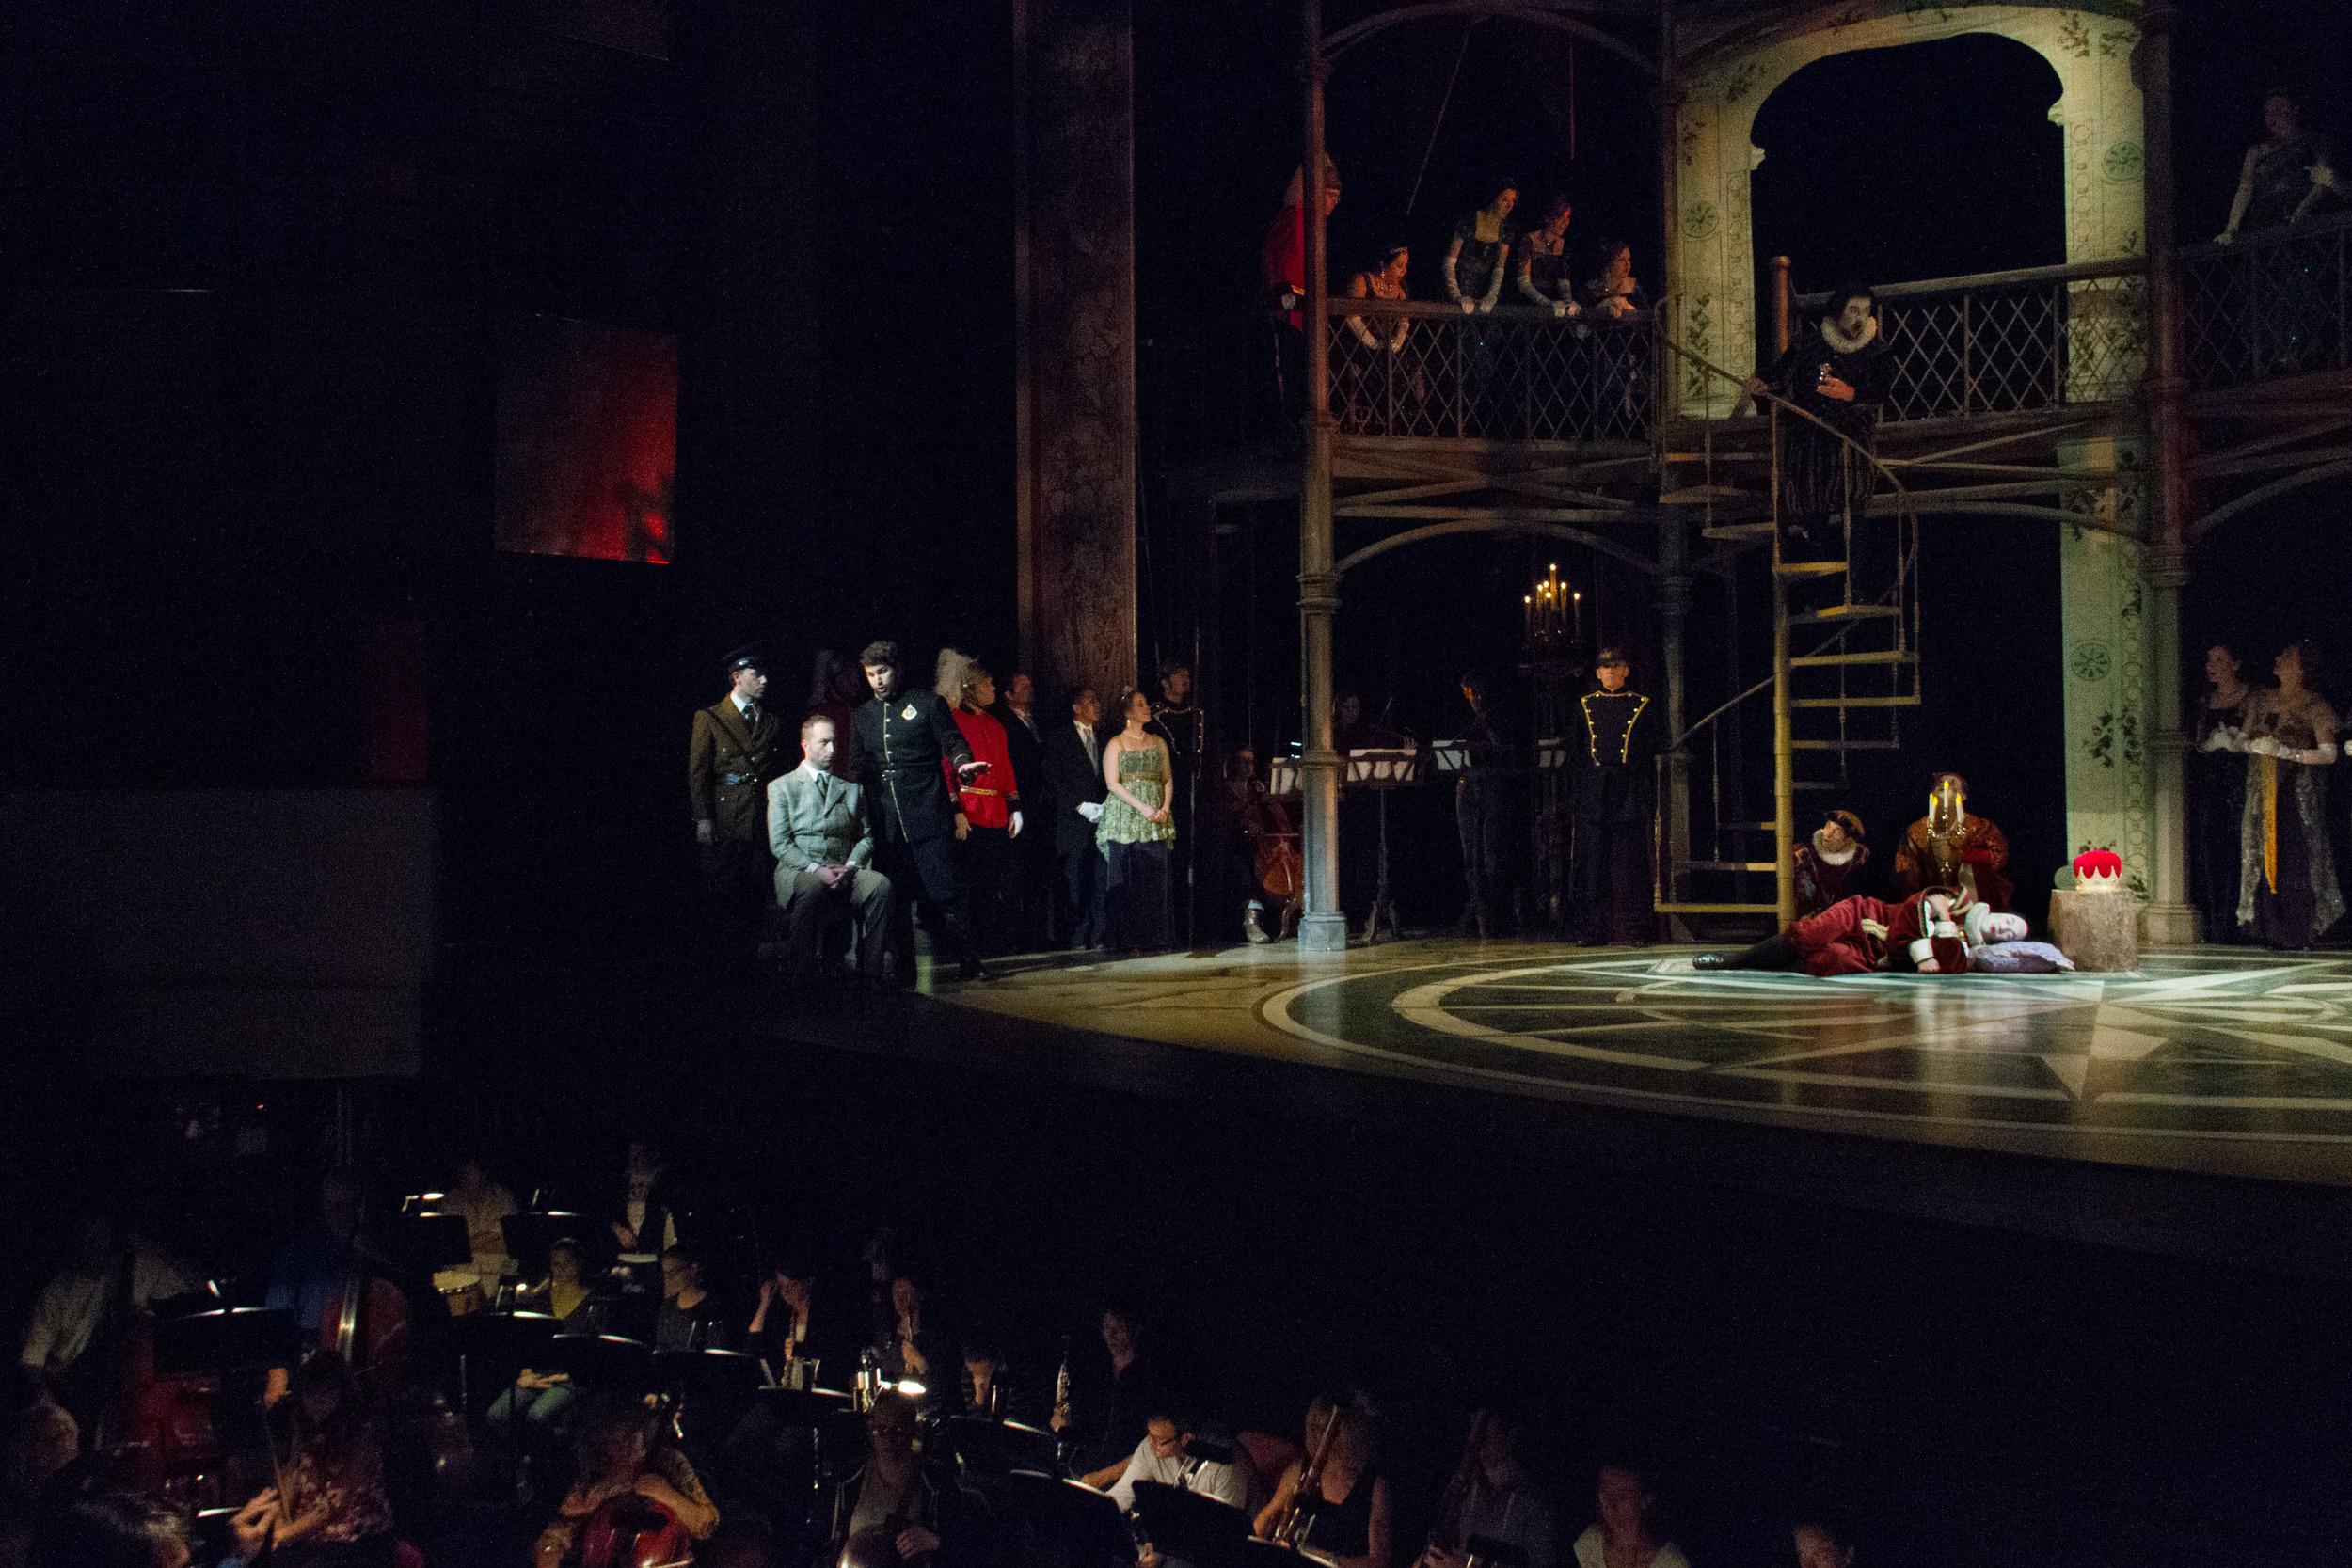 Watching Hamlet's murderous play